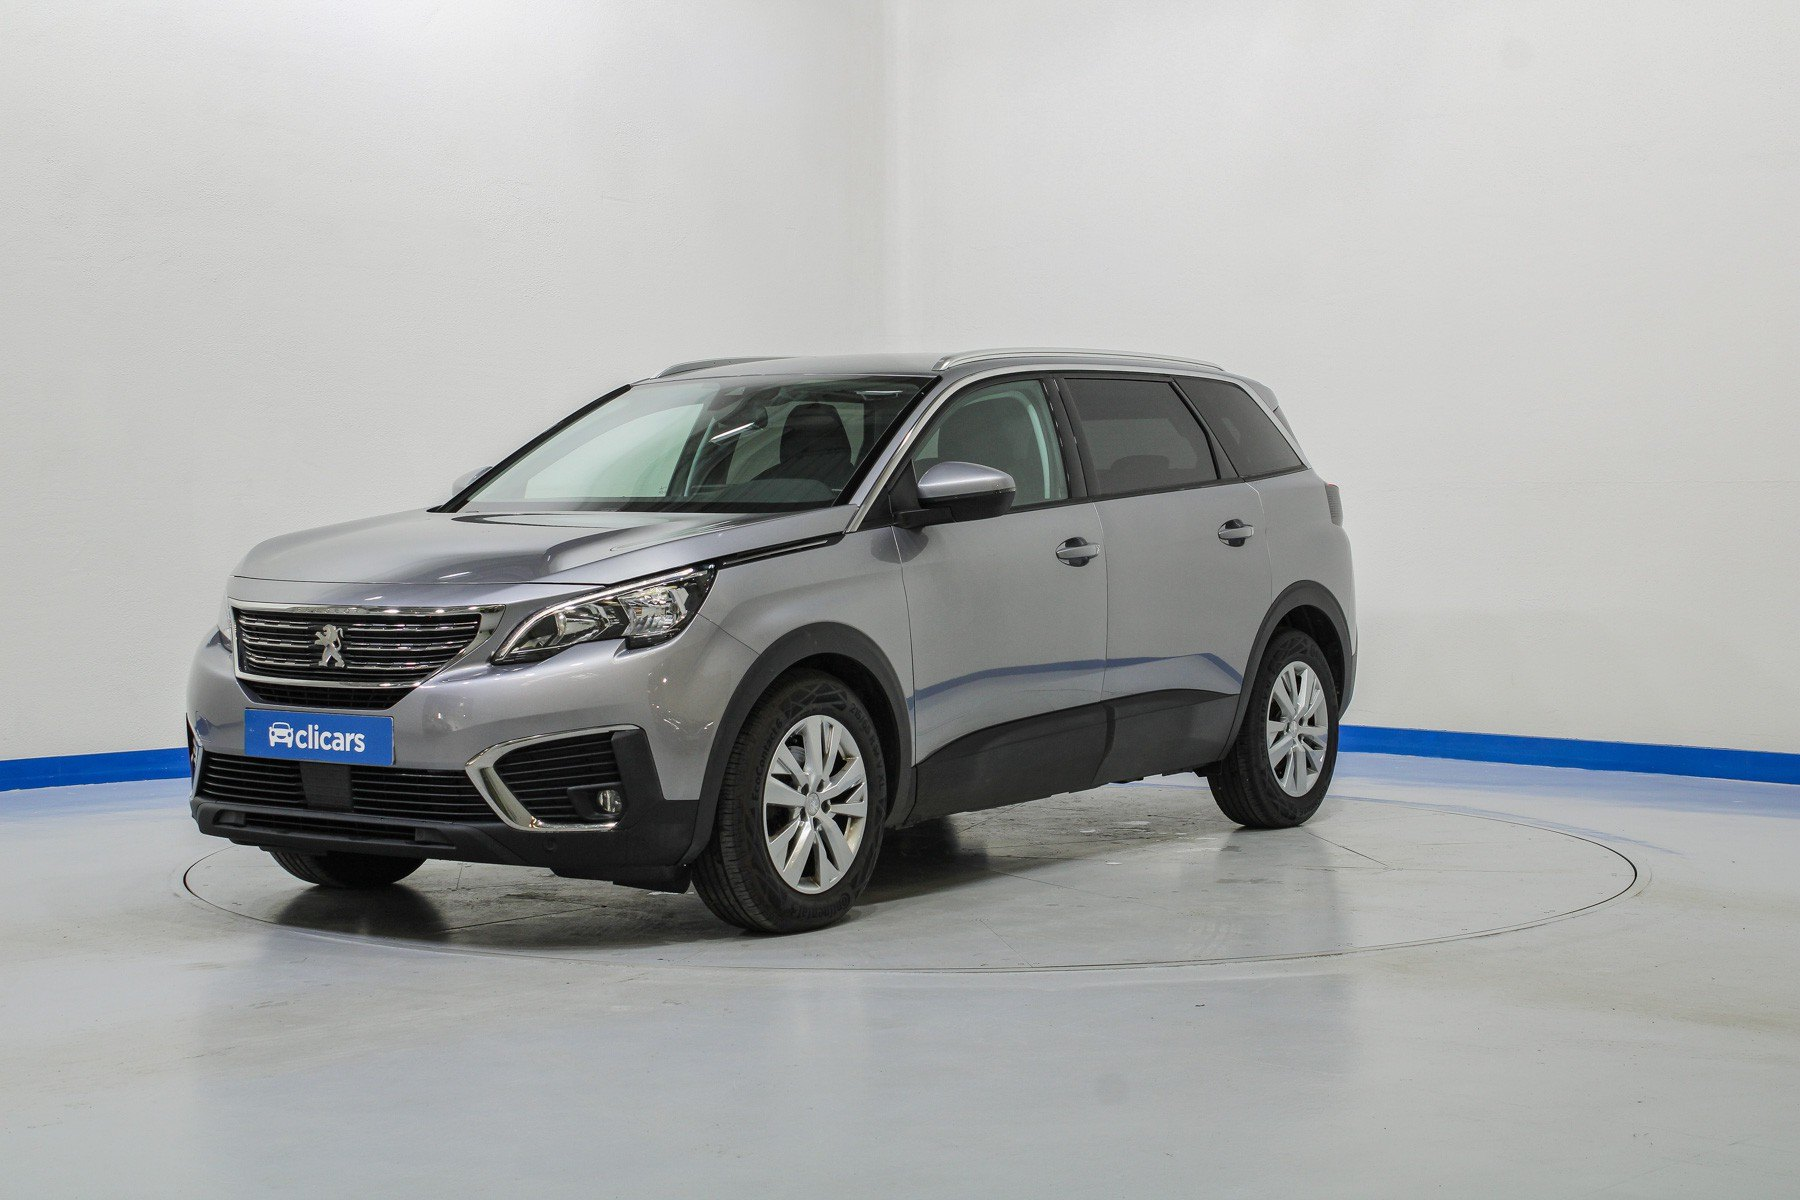 Peugeot 5008 Diésel Active 1.5L BlueHDi 96kW (130CV) S&S 1